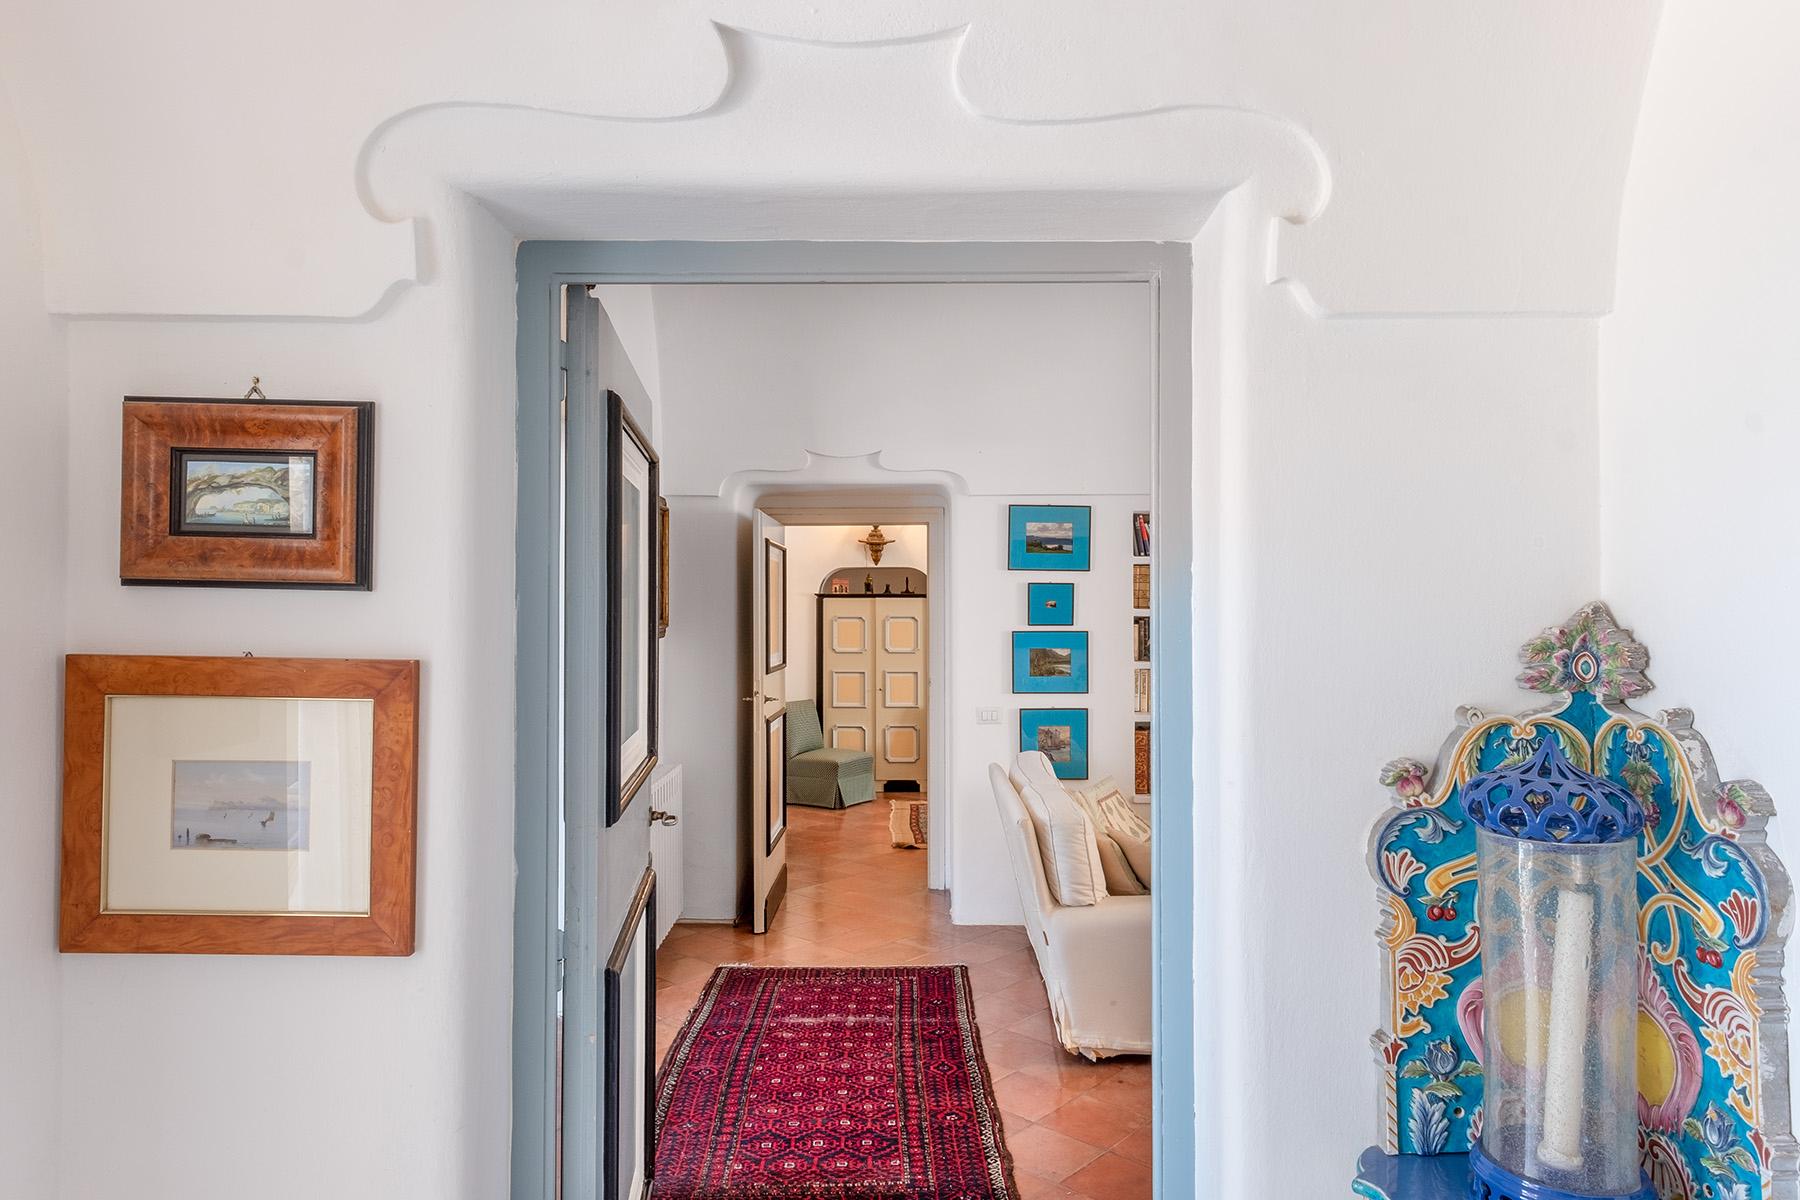 Casa indipendente in Vendita a Capri: 5 locali, 300 mq - Foto 17